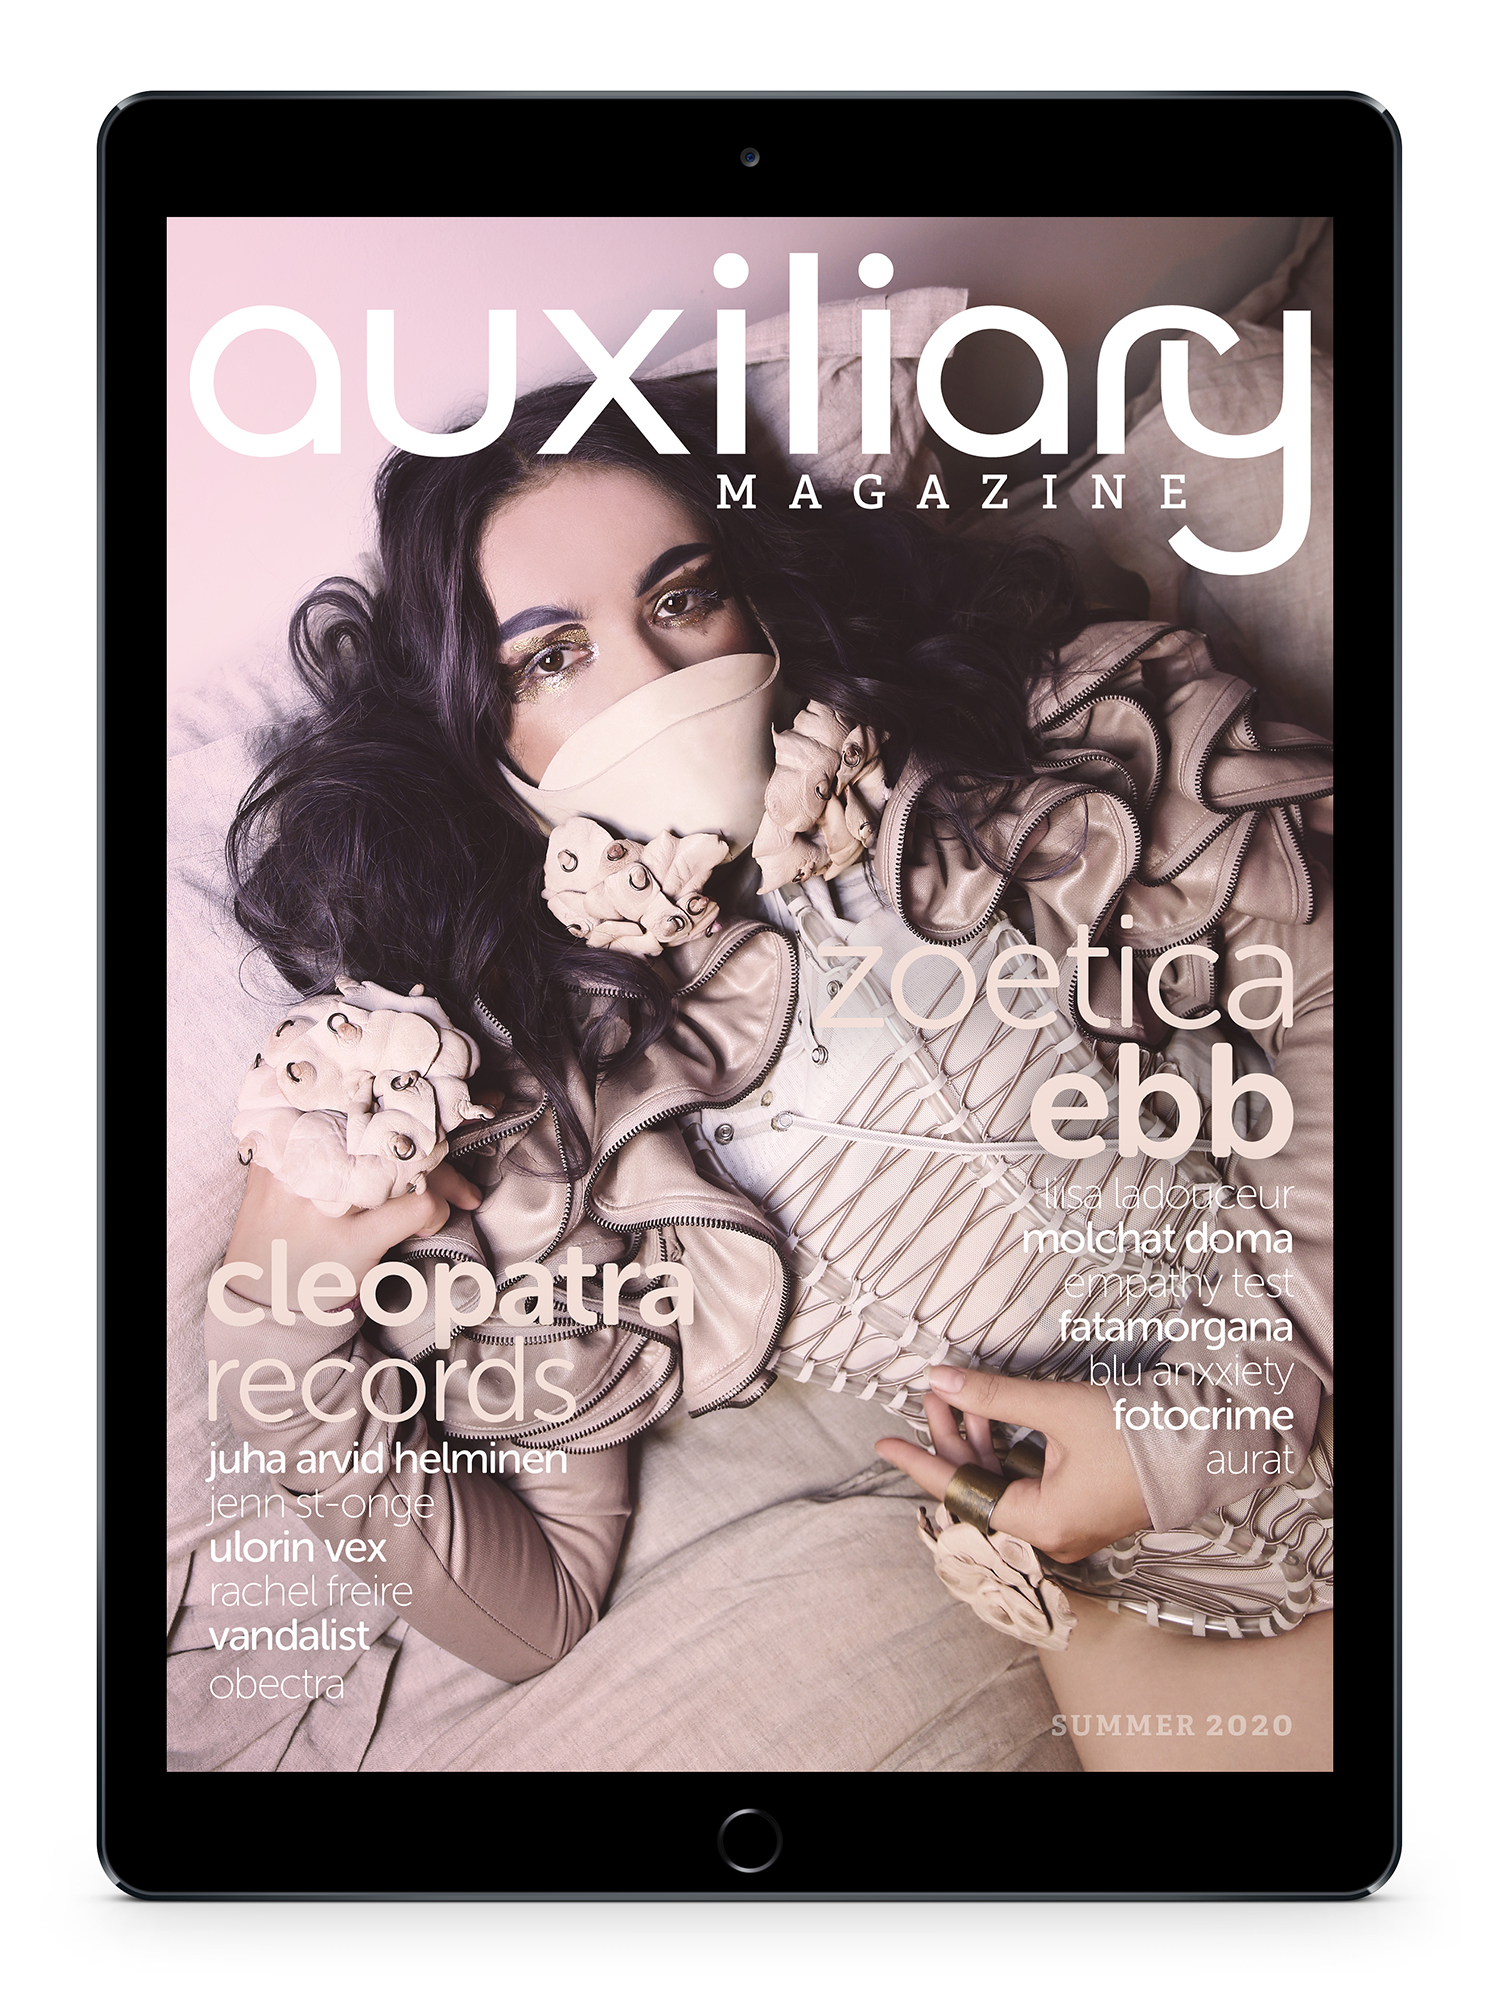 Auxiliary Magazine Summer 2020 Digital Issue